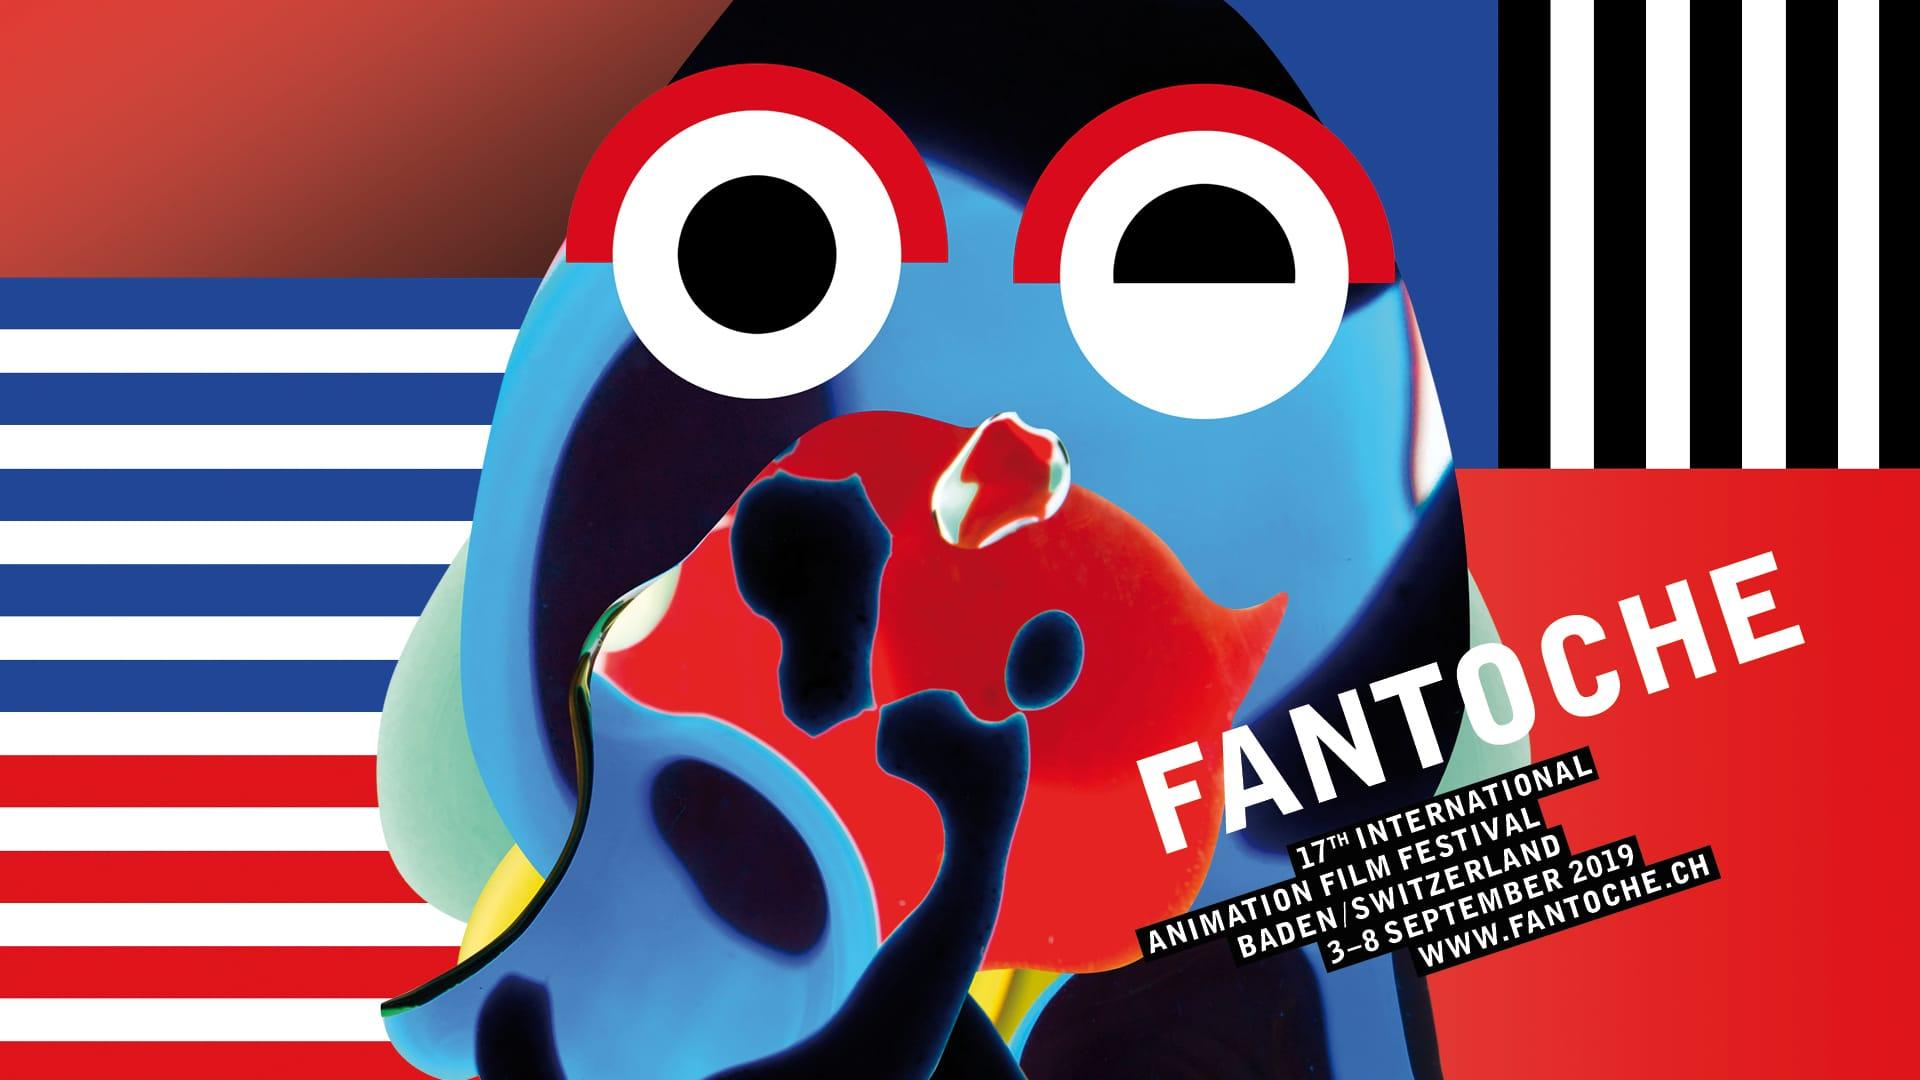 festival international du film d'animation Fantoche